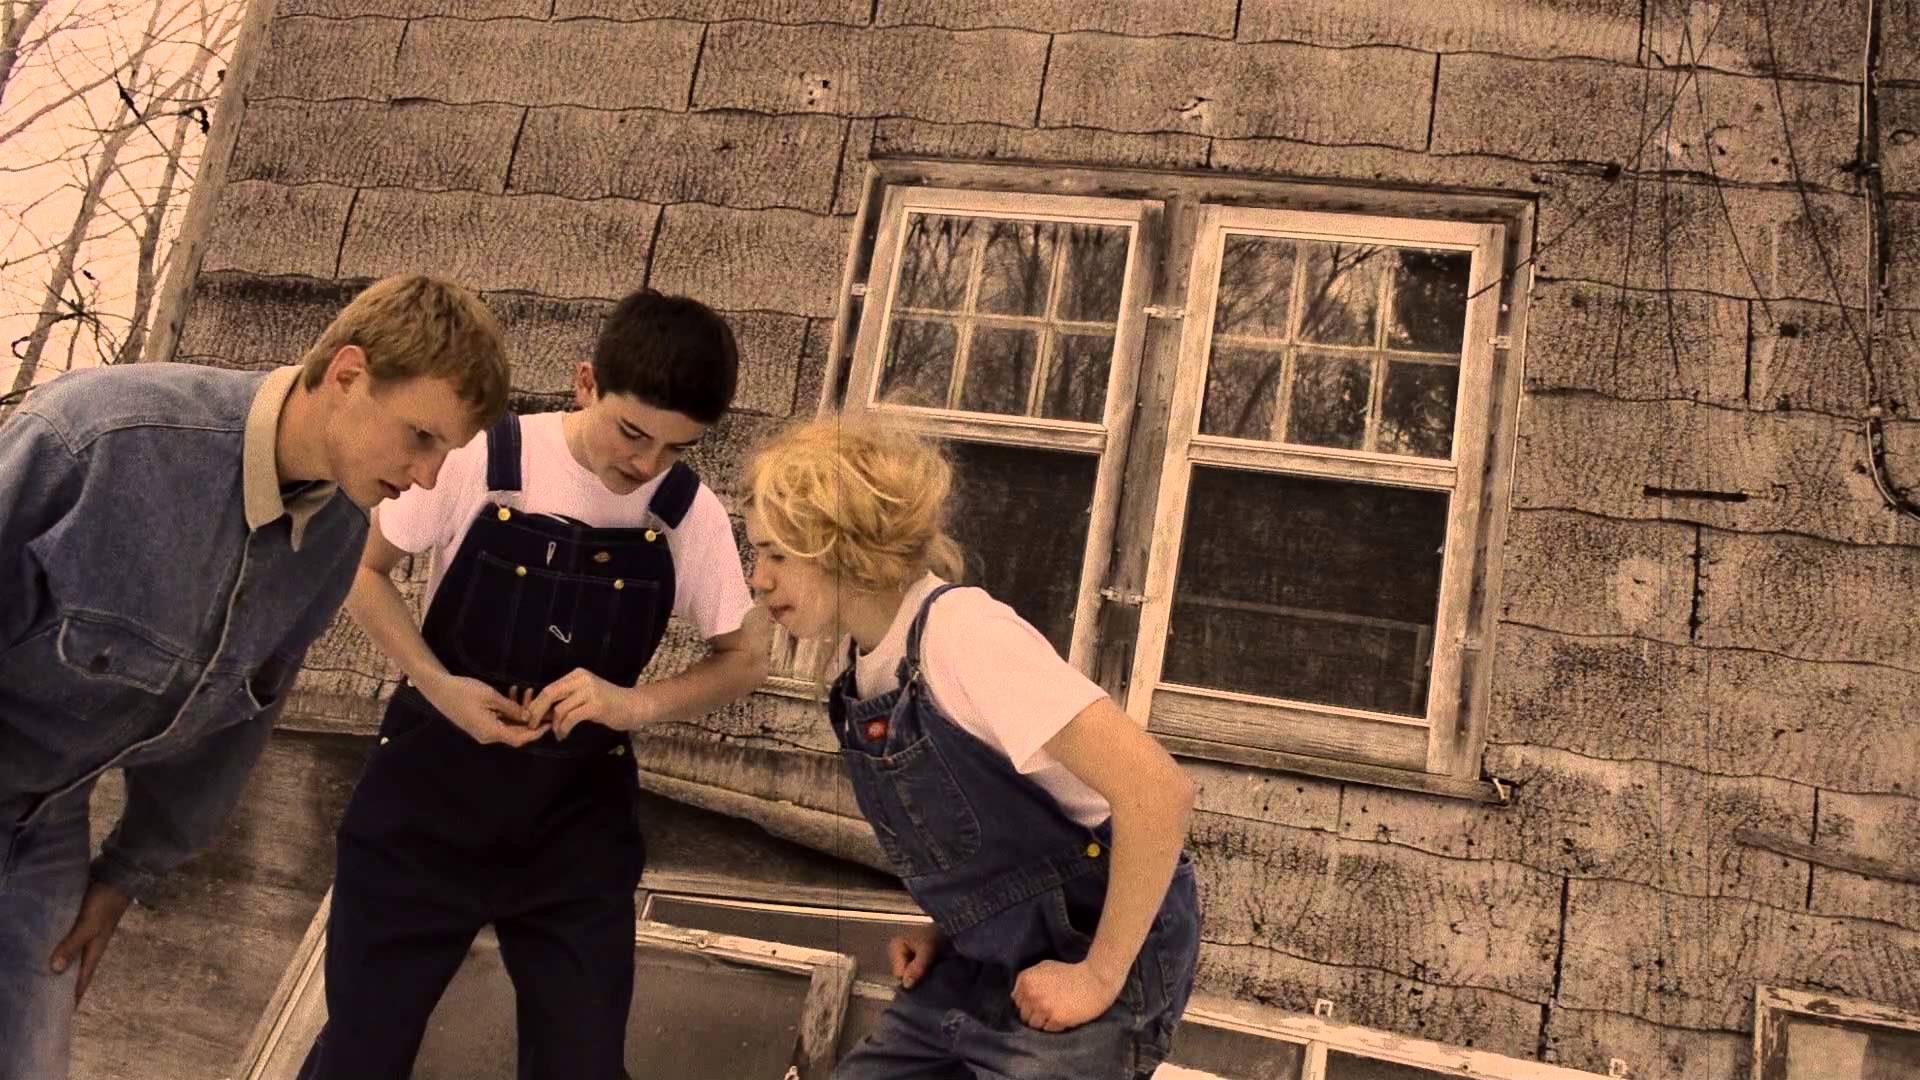 1920x1080 To Kill A Mockingbird Boo Radley's House Scene